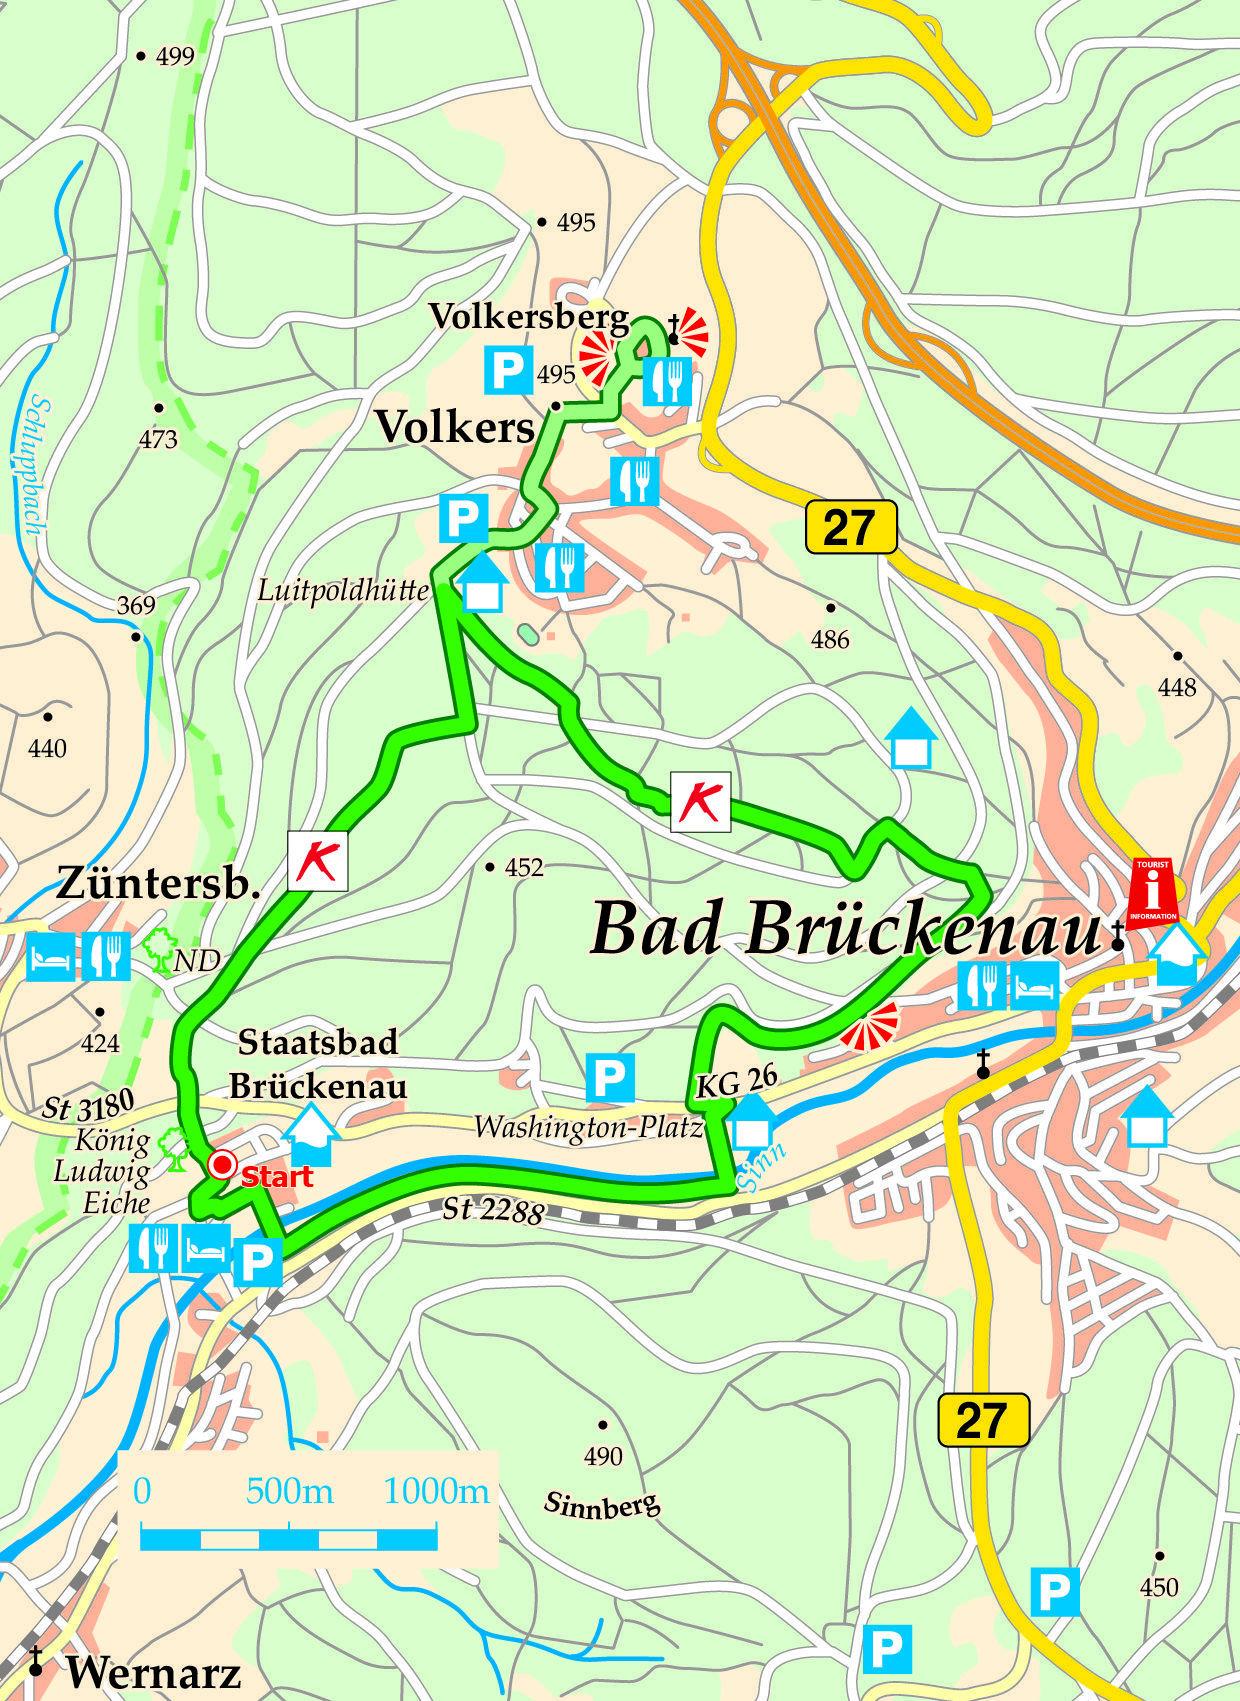 Extratour Konigsweg Karte Reisen Bad Bruckenau Ludwig